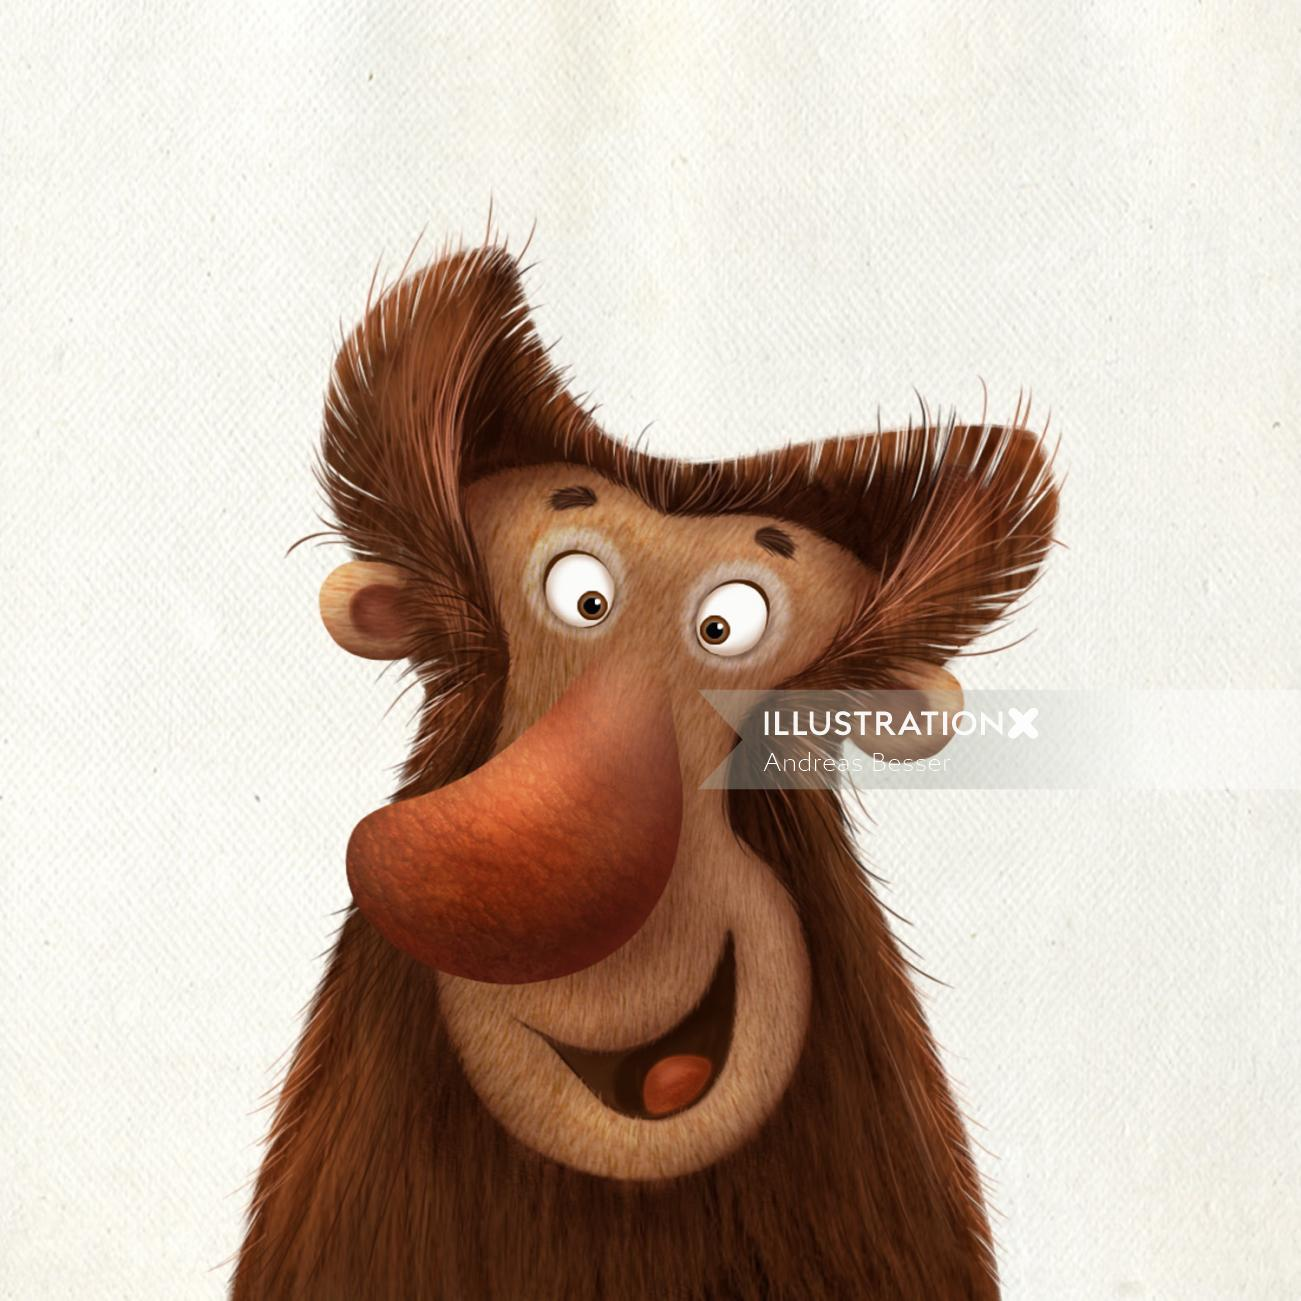 Cartoon illustration of smiley monkey